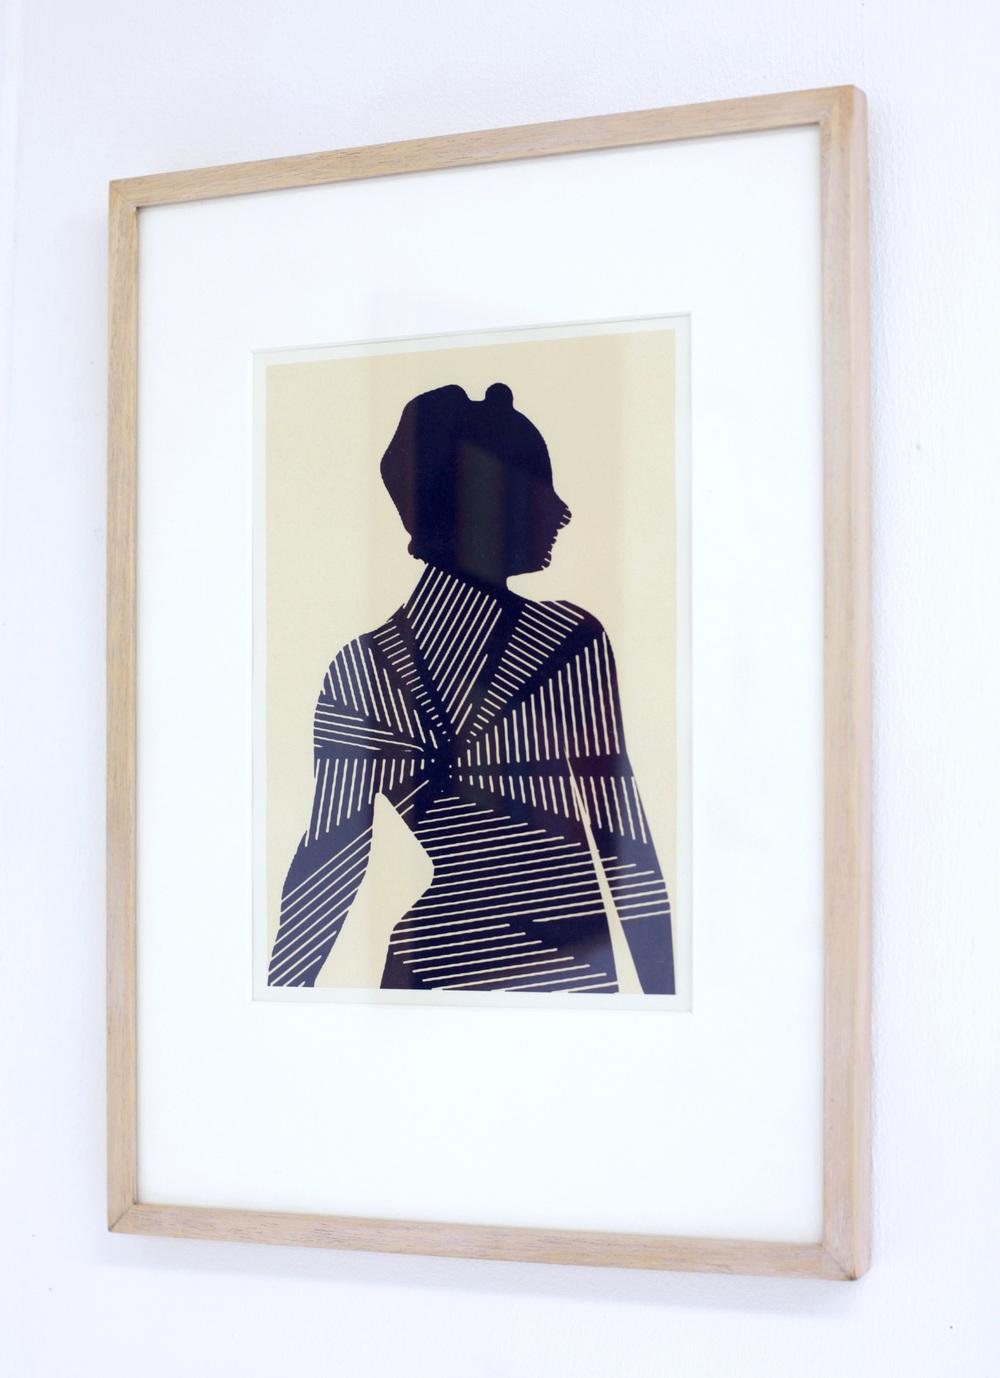 'Madame X (after Singer Sargeant)', 2012/13, digital print on off-white cartdridge paper, 29.5 x 42cm